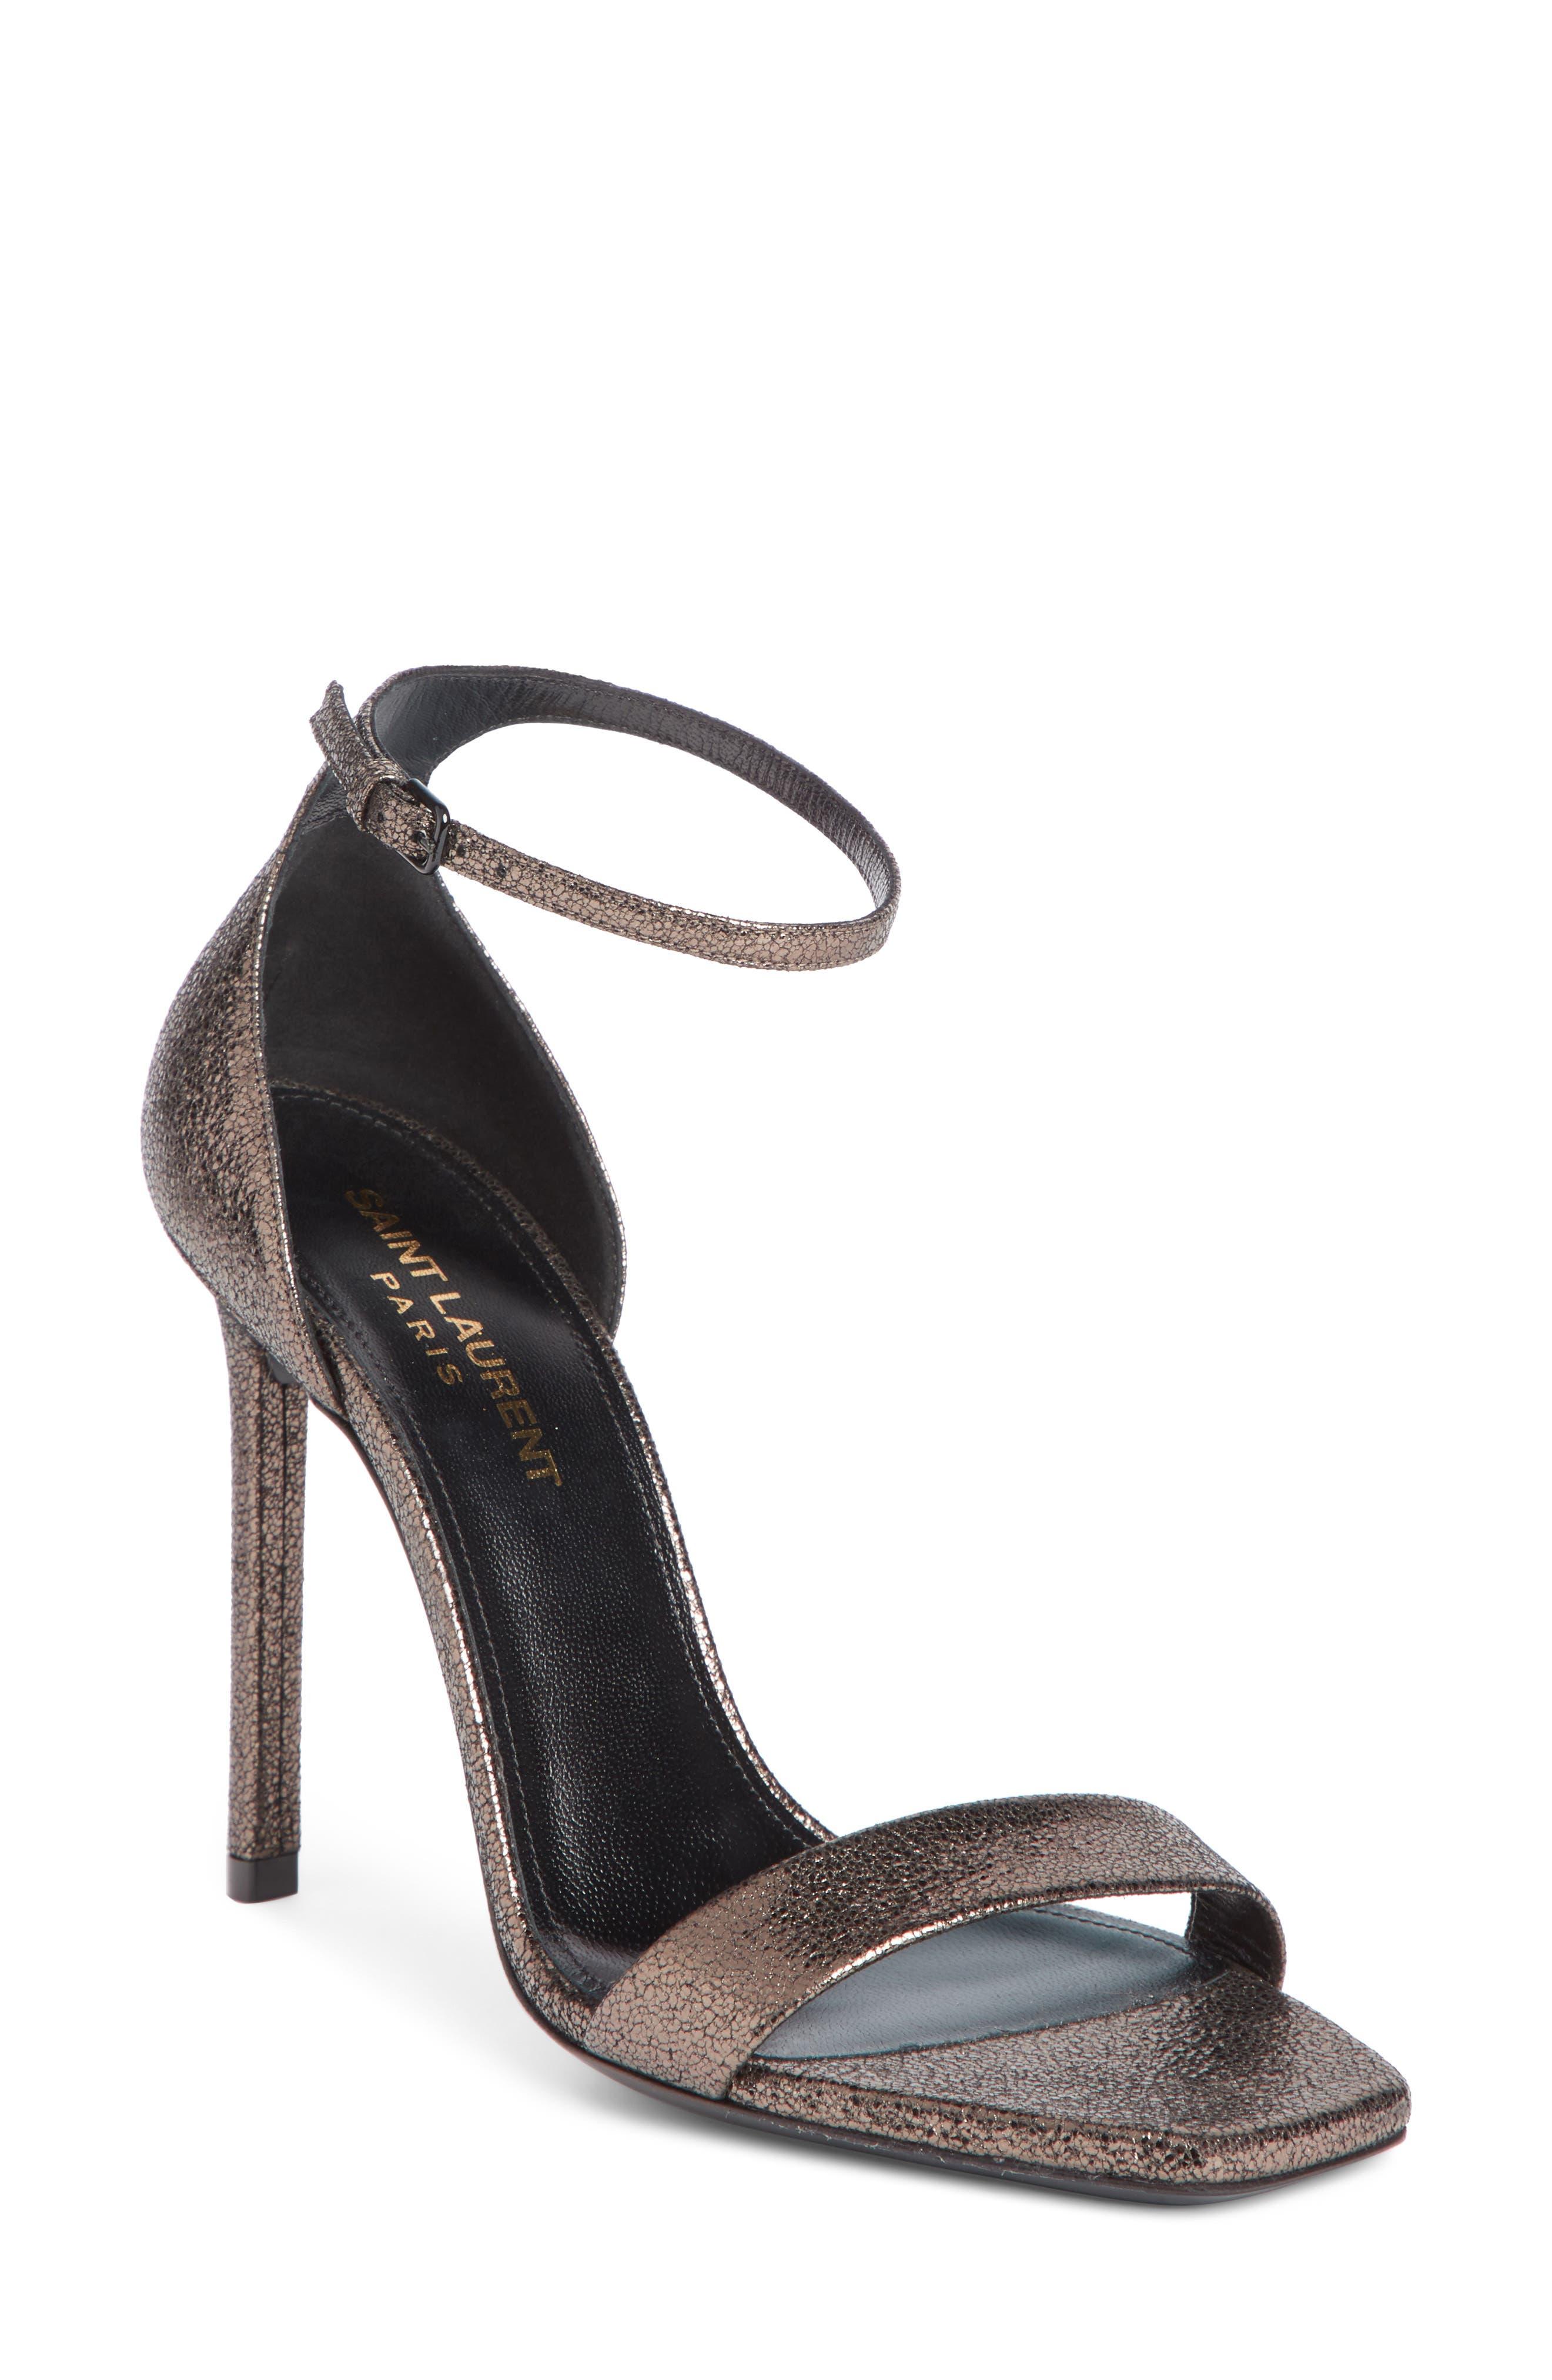 Amber Ankle Strap Sandal,                         Main,                         color, BLACK/ METALLIC